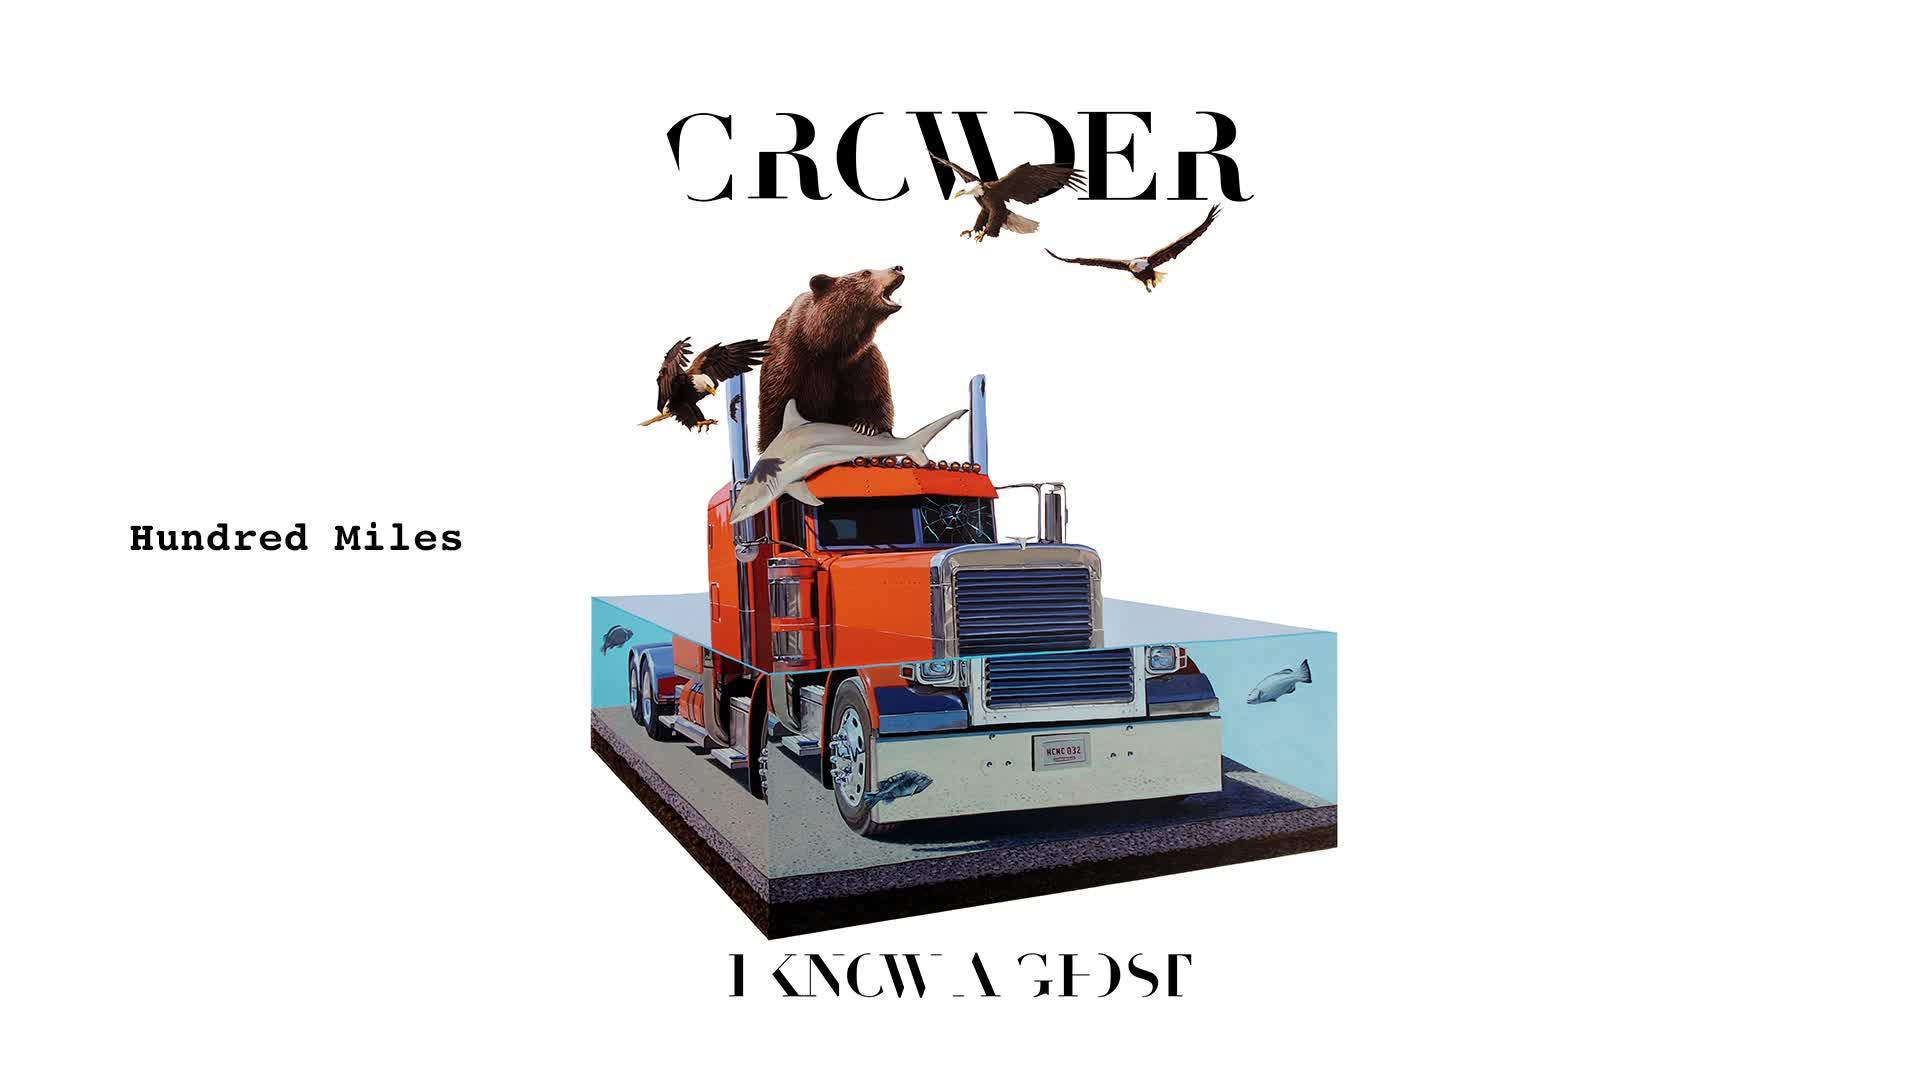 Crowder - Hundred Miles